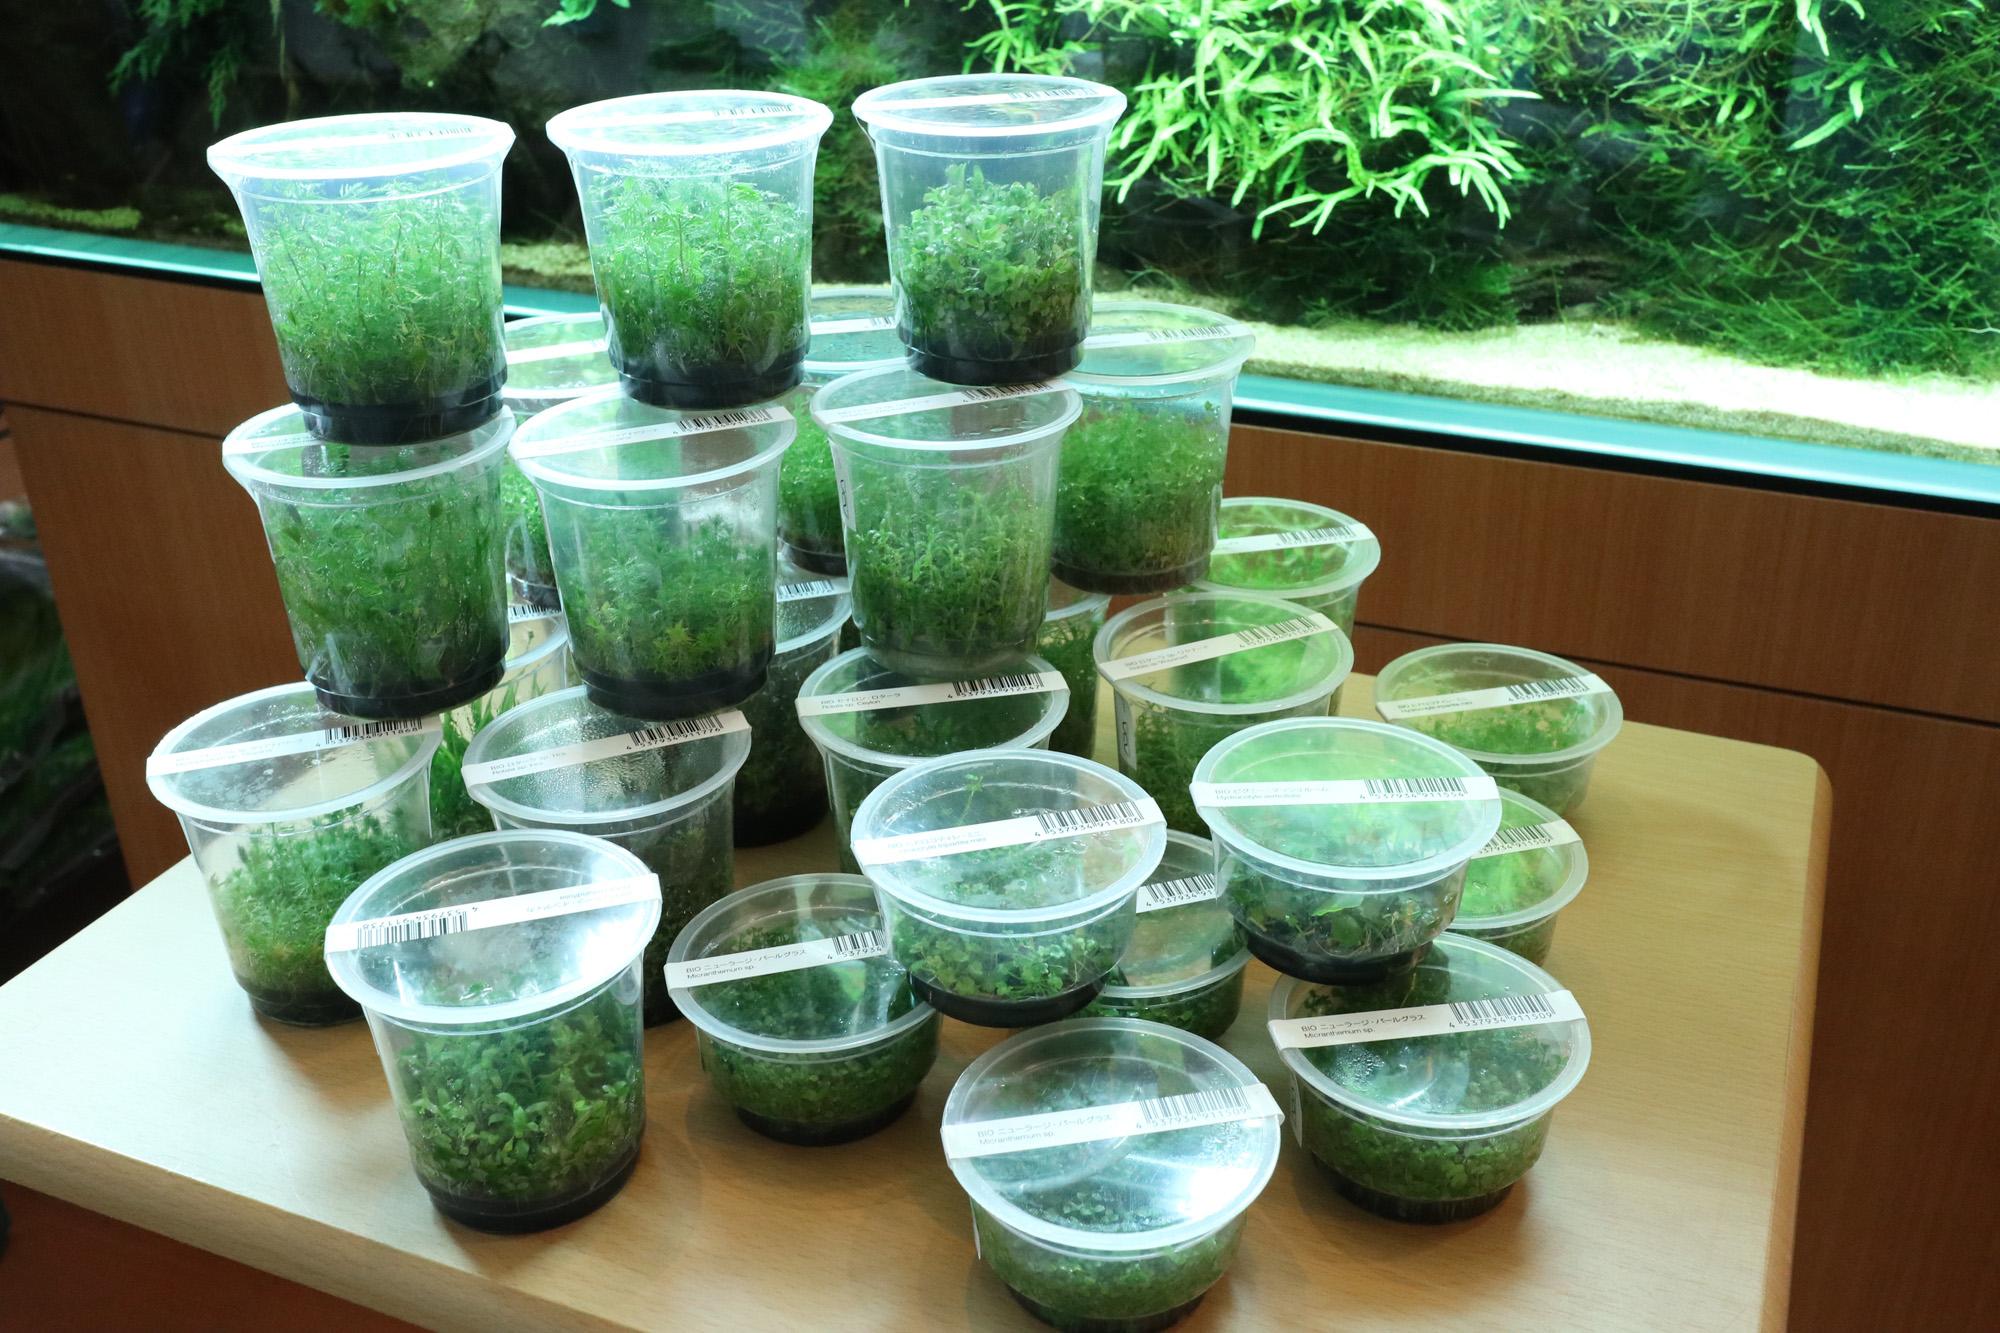 ADA組織培養水草「BIO水草の森」が大量入荷しました!